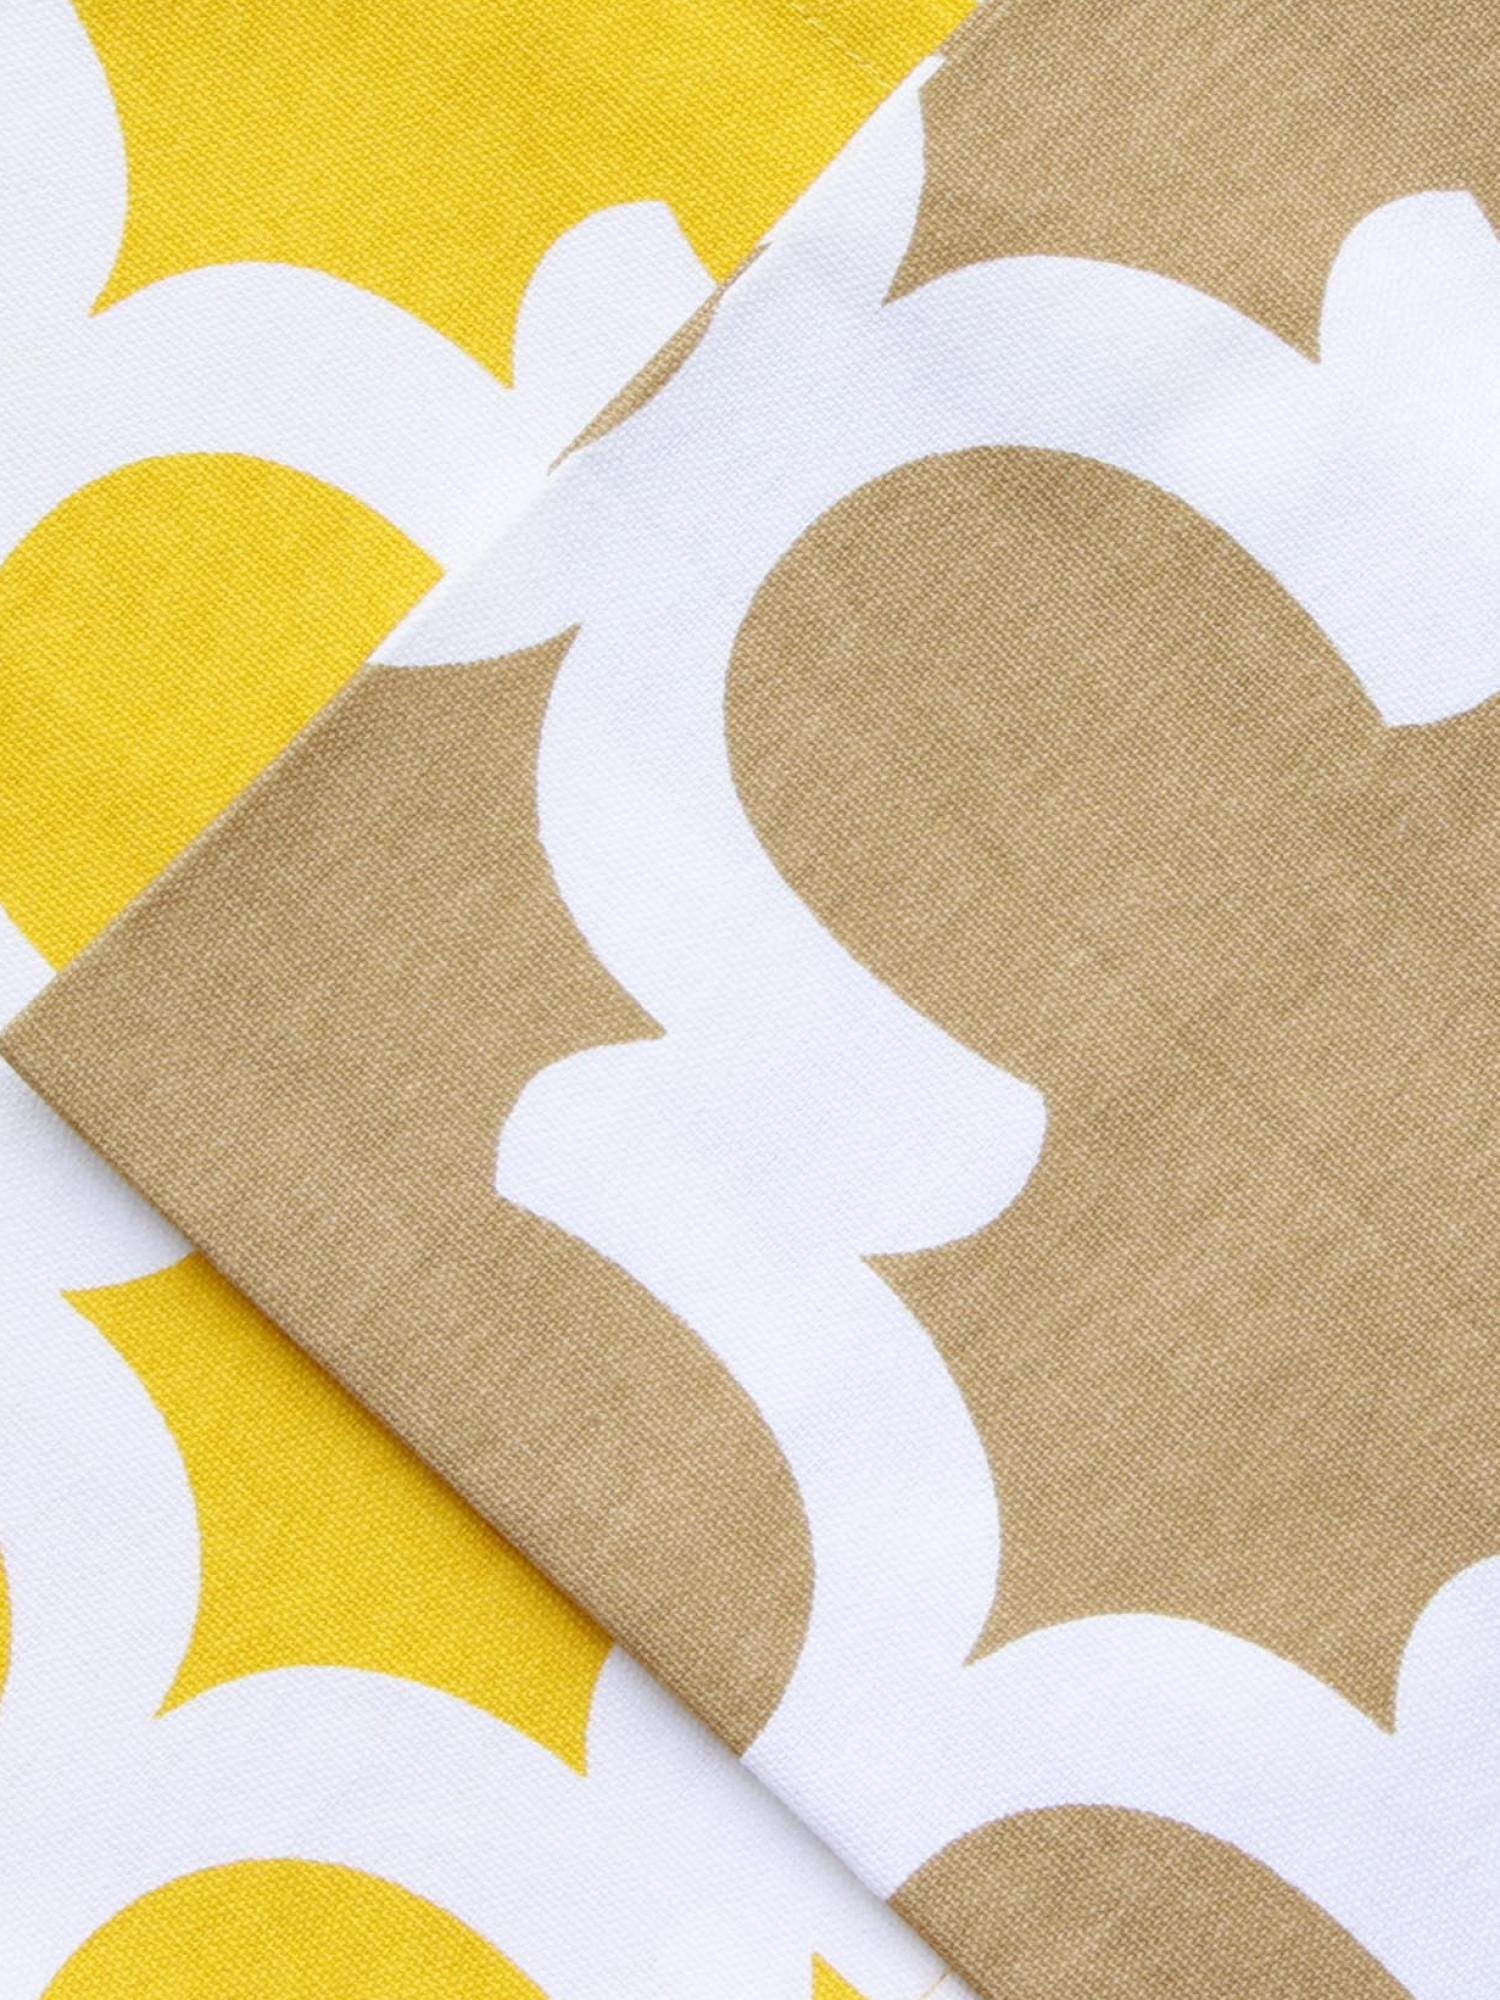 High Absorbent 100% Cotton Multipurpose Kitchen Napkin, Duster